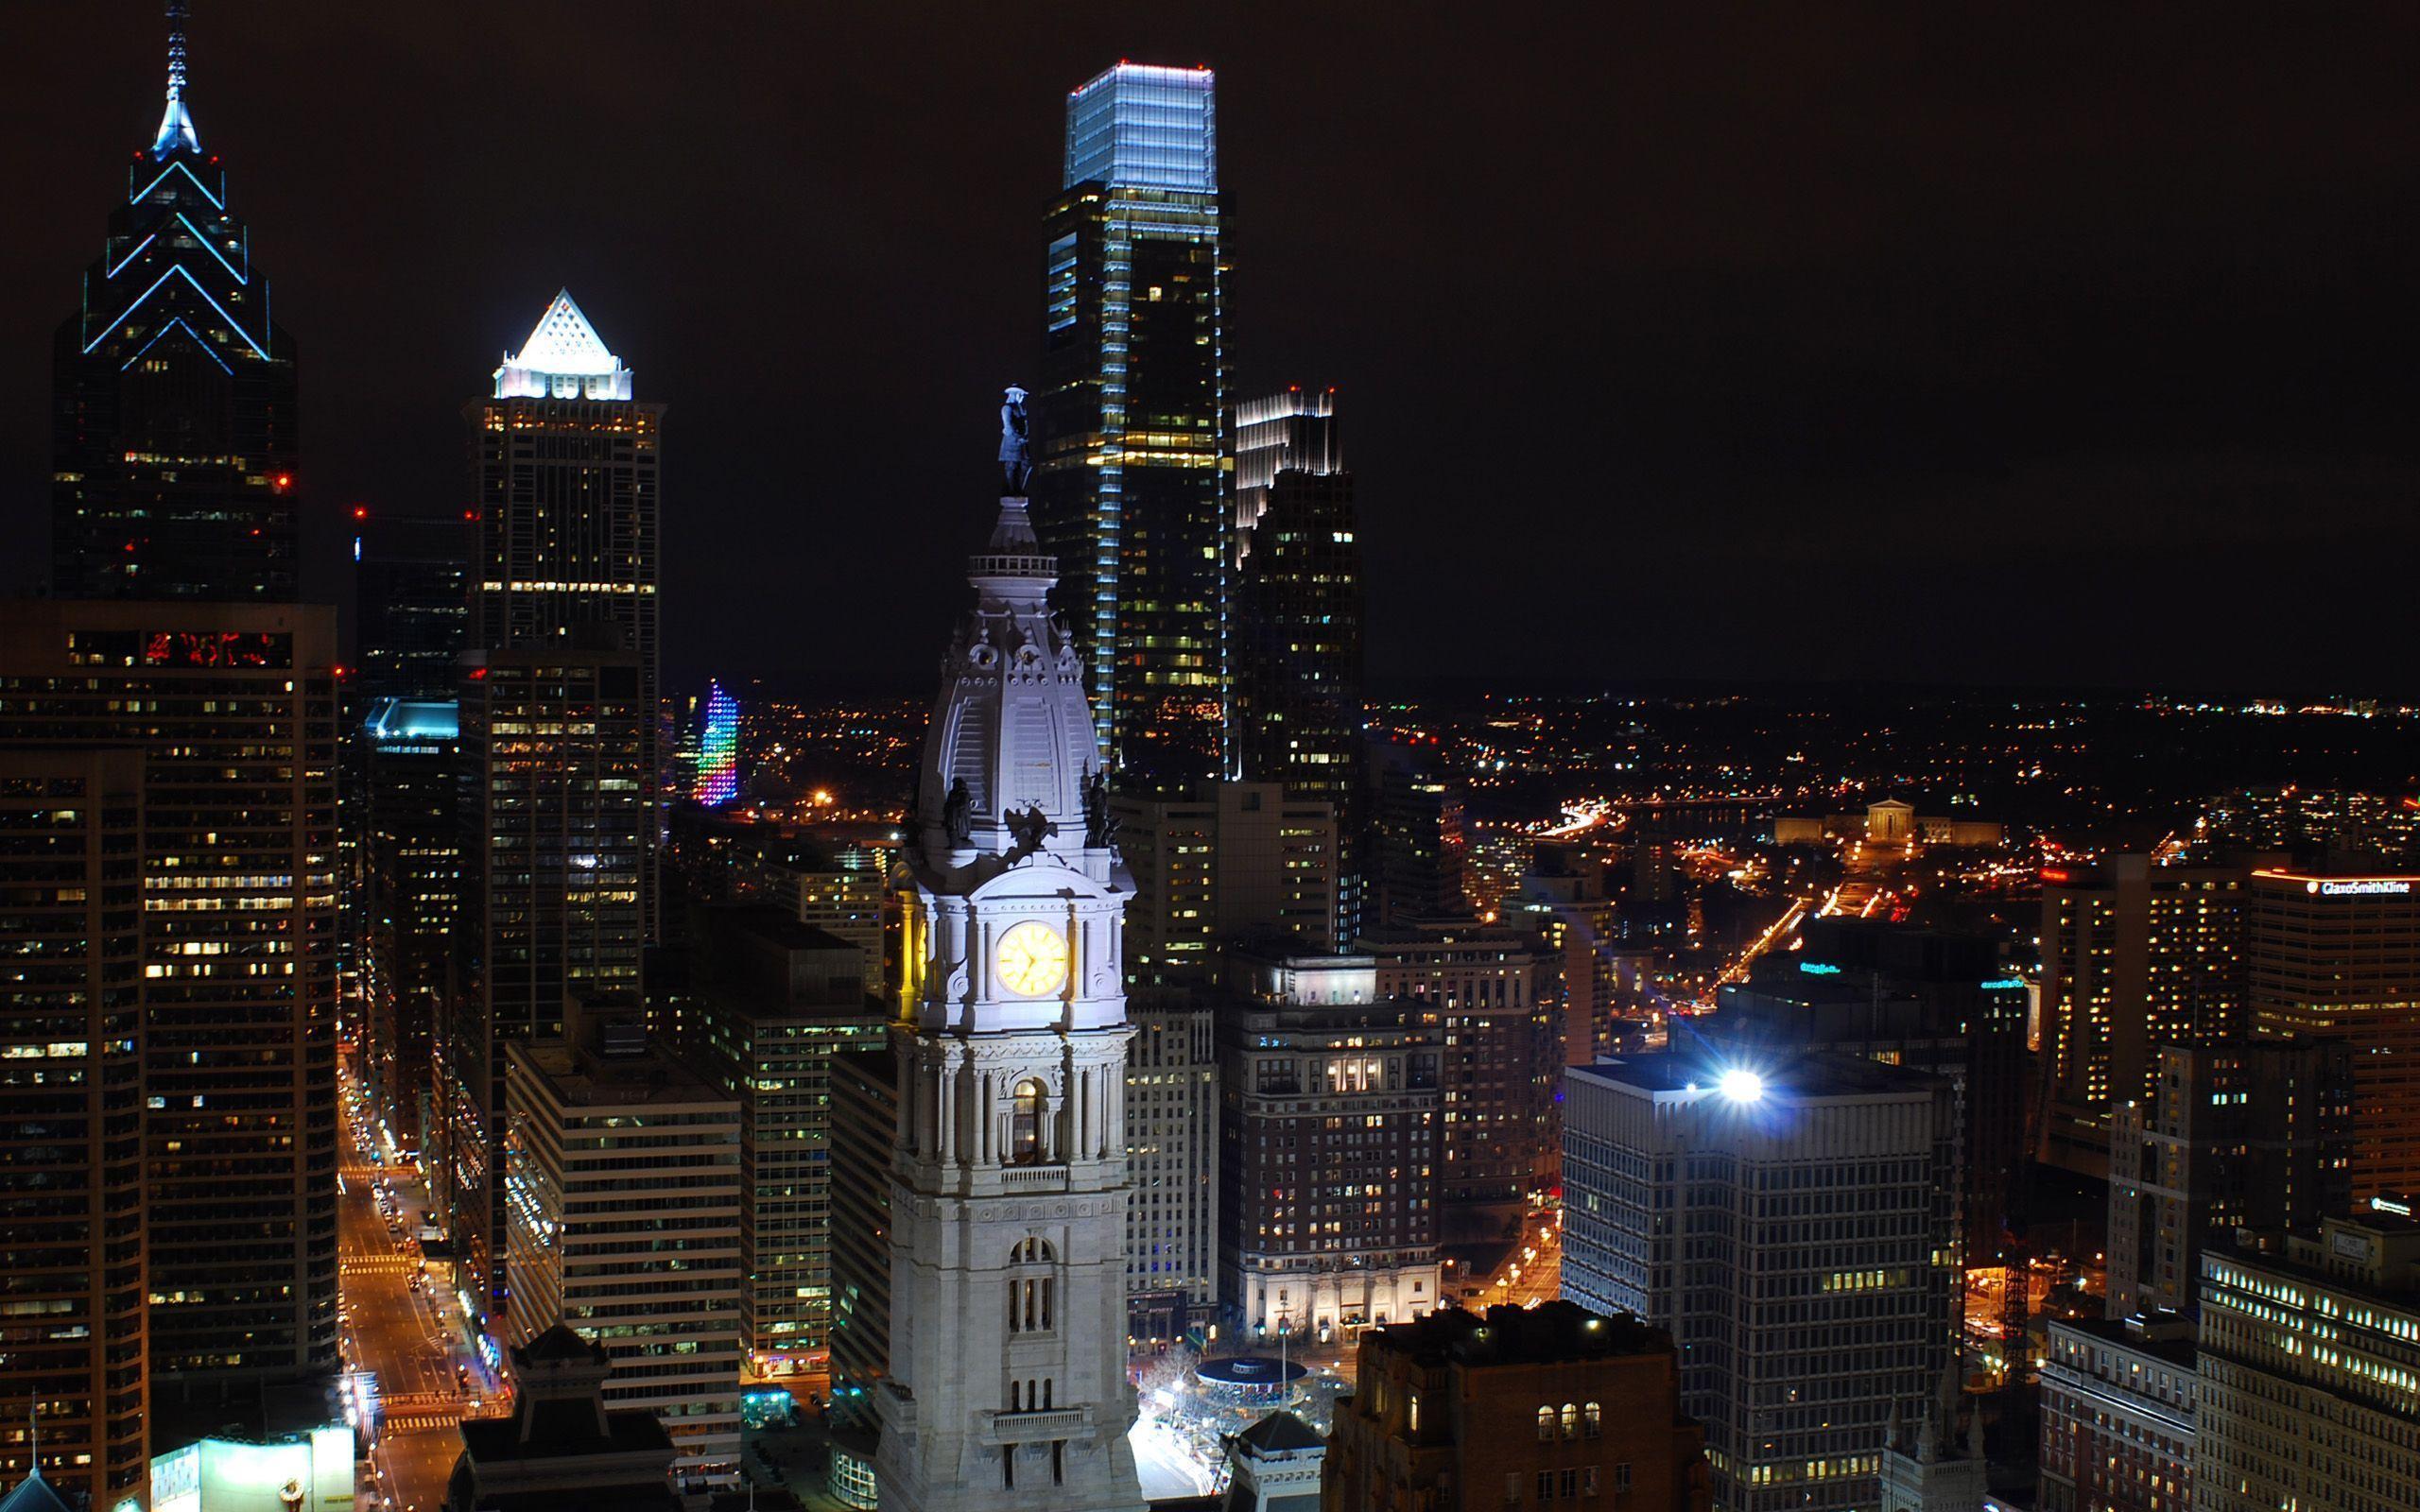 Philadelphia skyline wallpapers wallpaper cave - Skyline night wallpaper ...